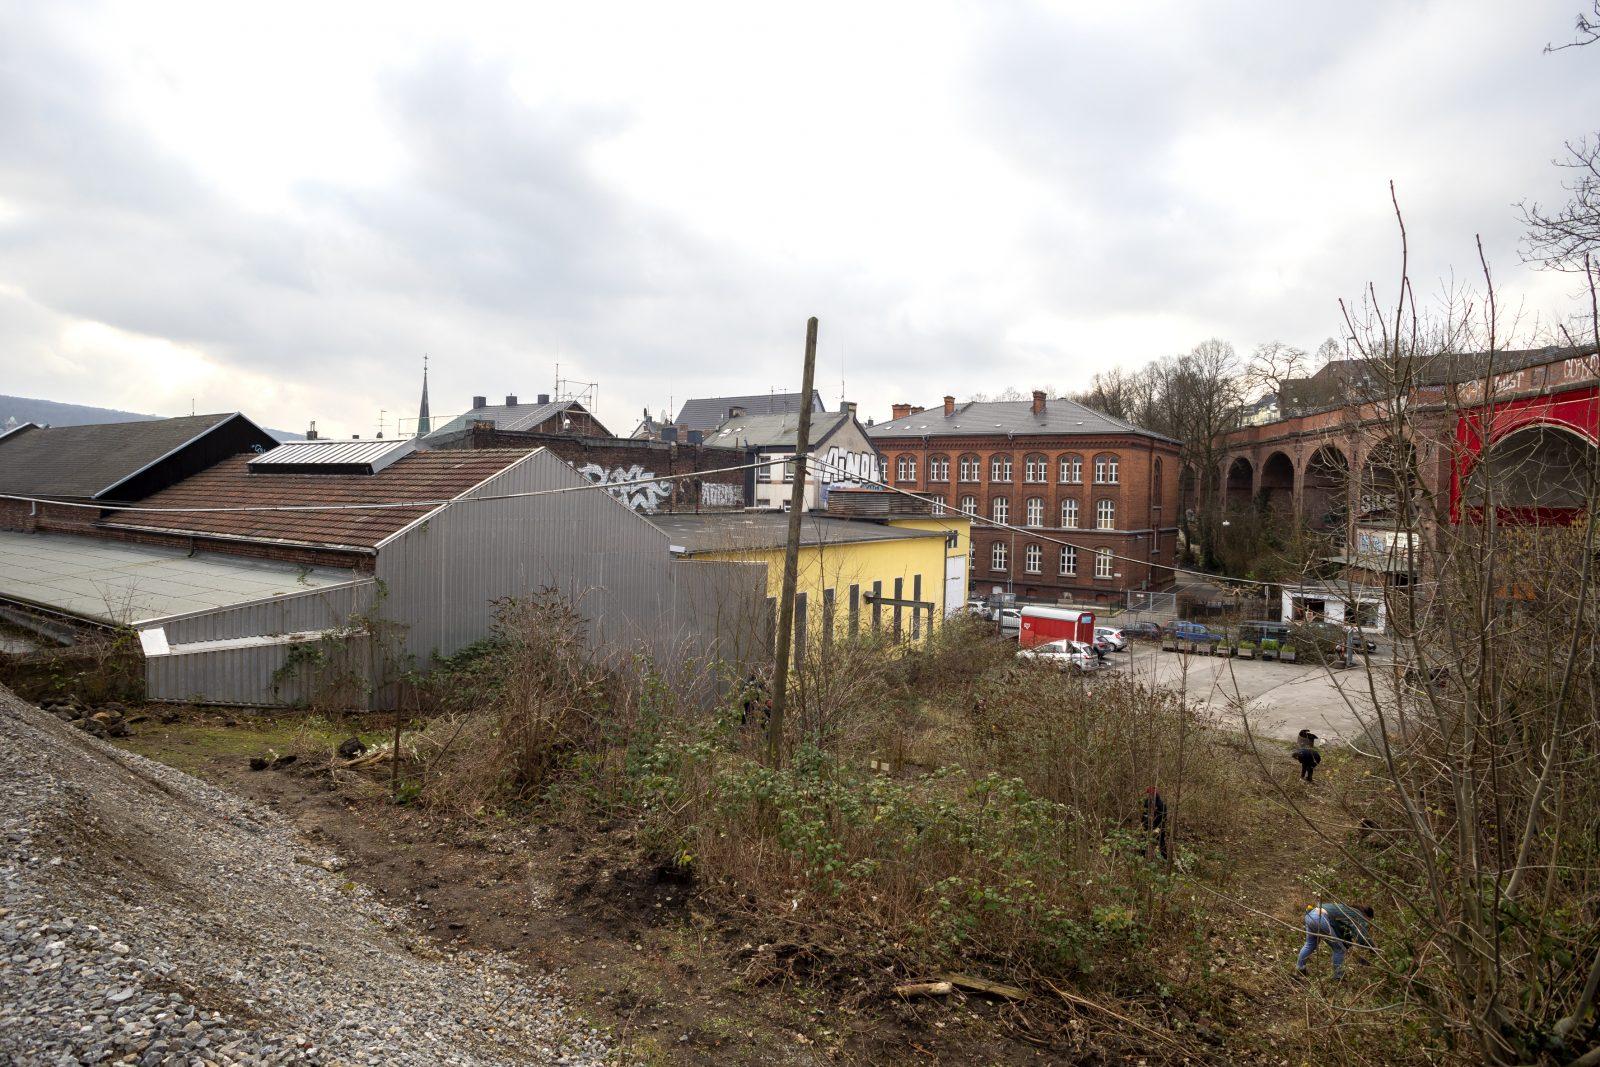 Foto: Wolf Sondermann, (C) Urbane Nachbarschaft BOB gGmbH